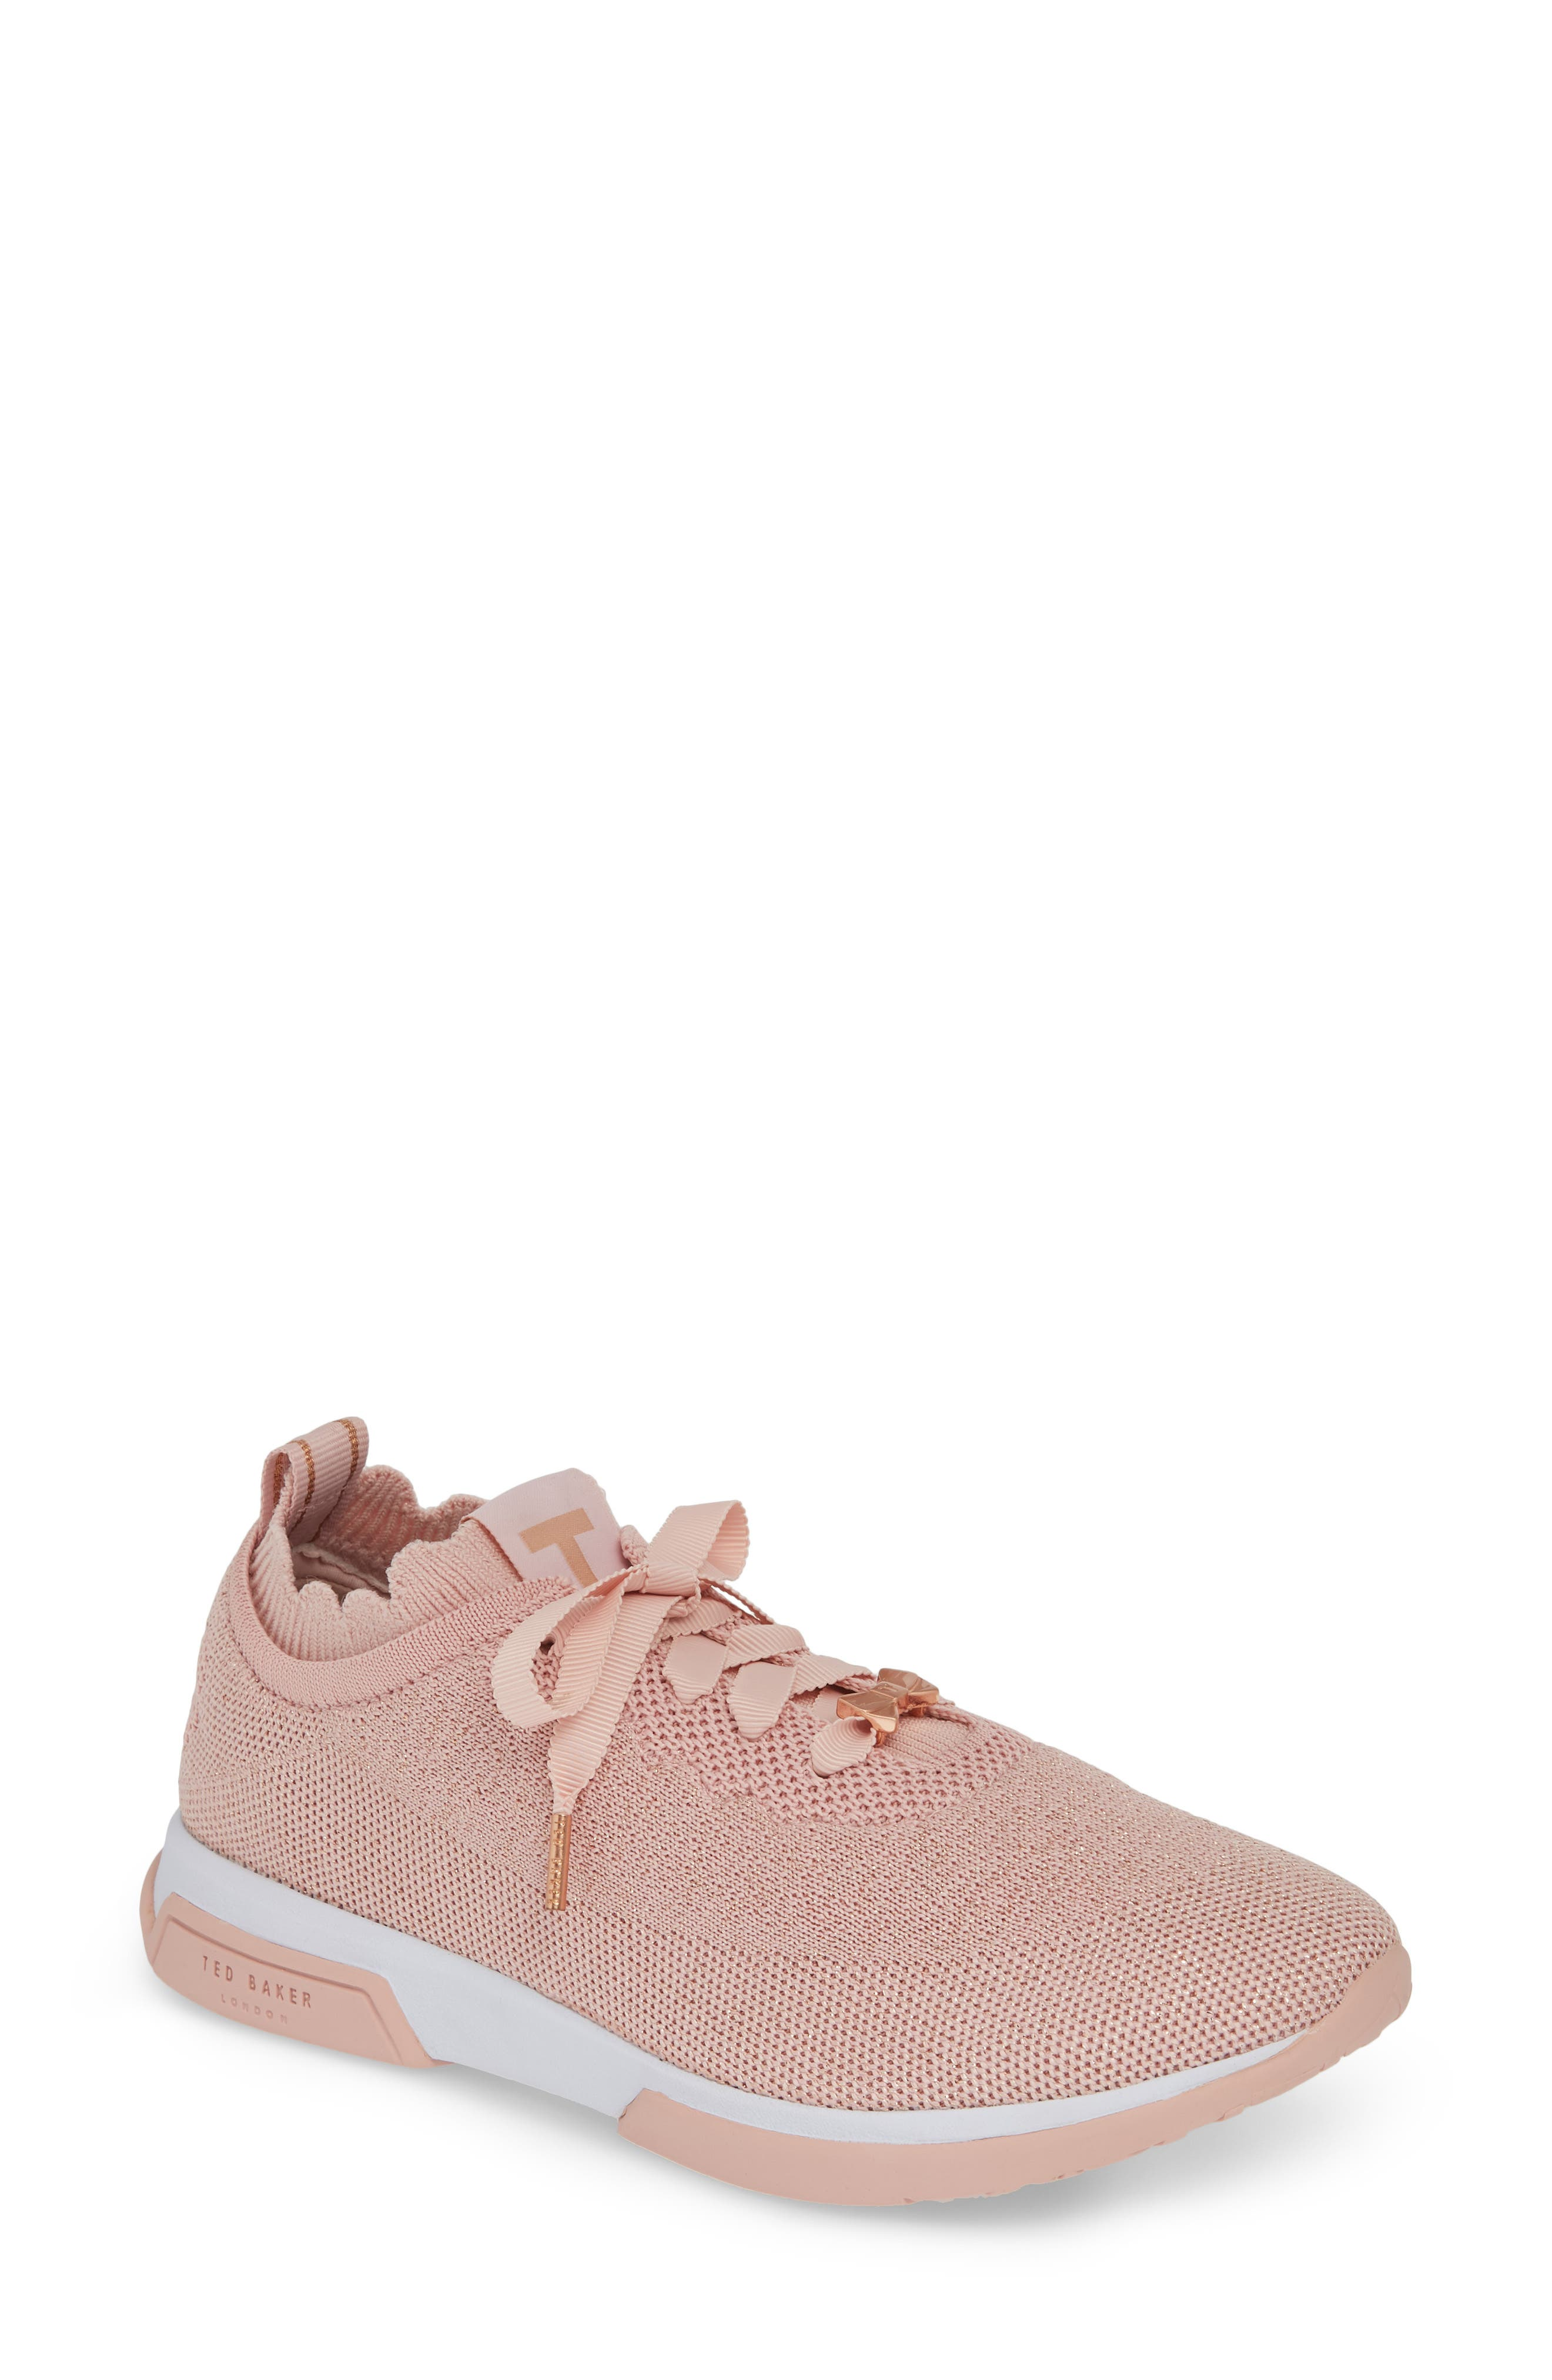 Ted Baker London Lyara Sneaker, Pink